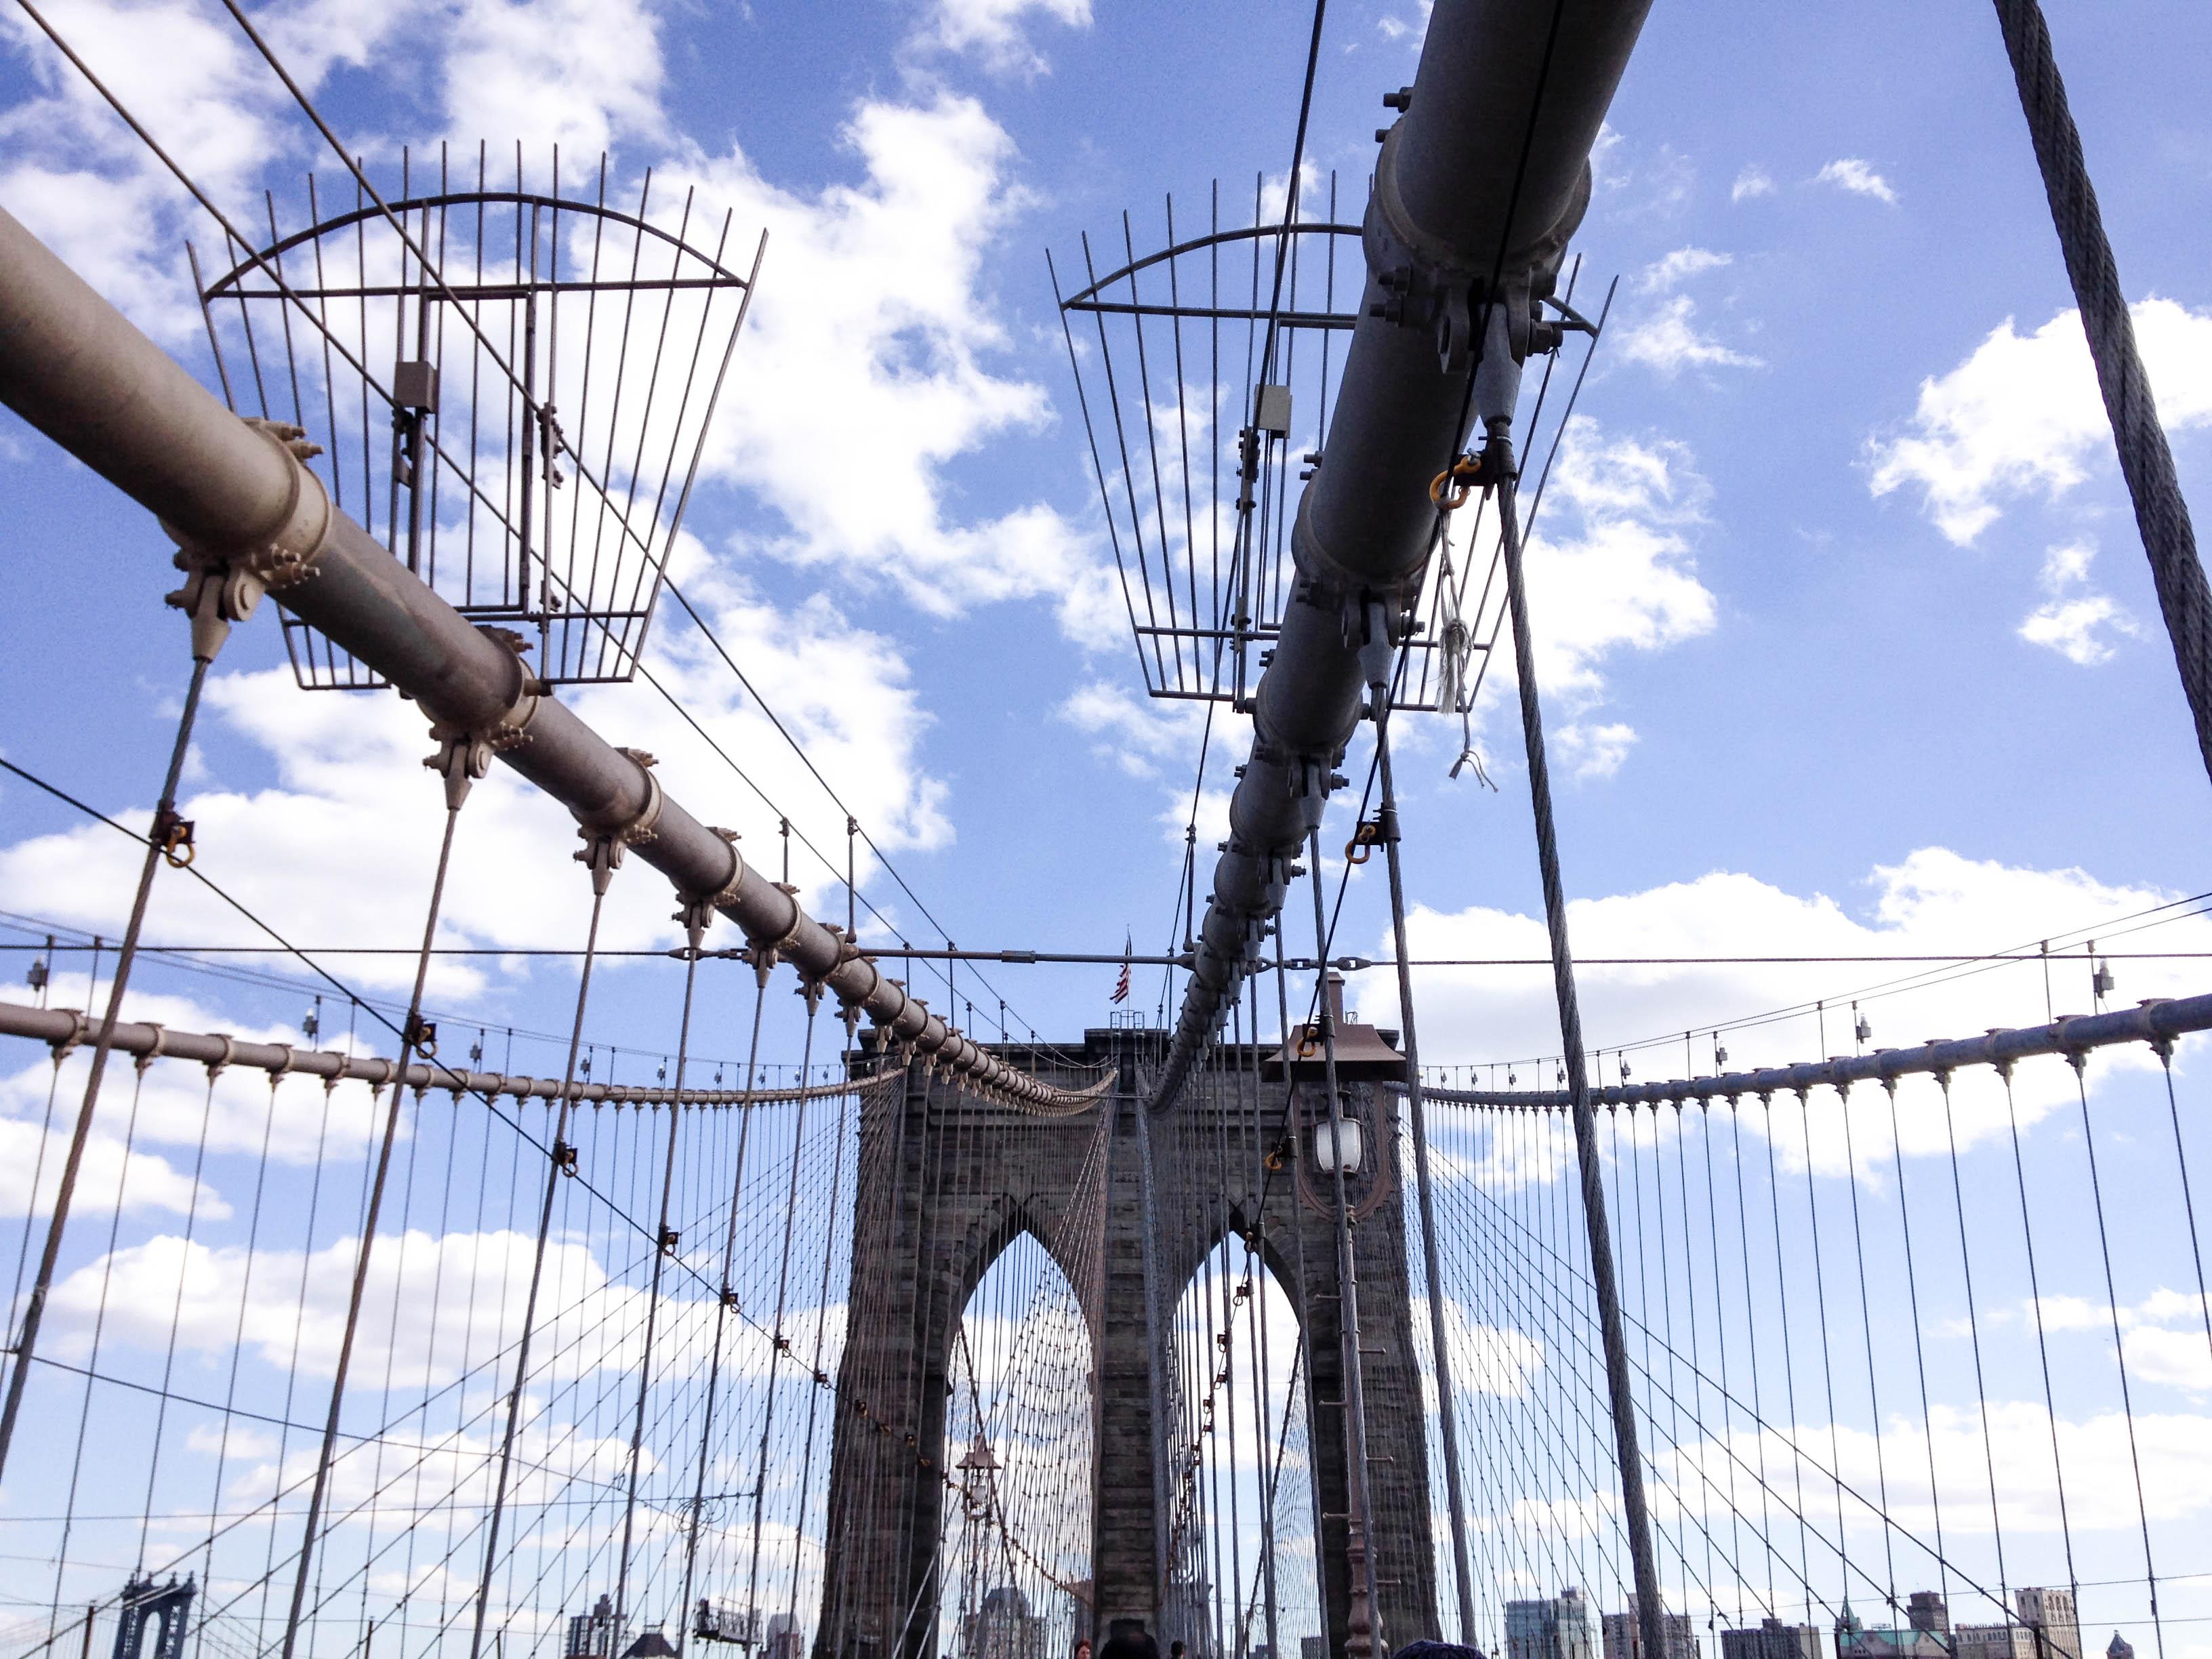 carnet-de-voyage-new-york-mademoisellevi-20